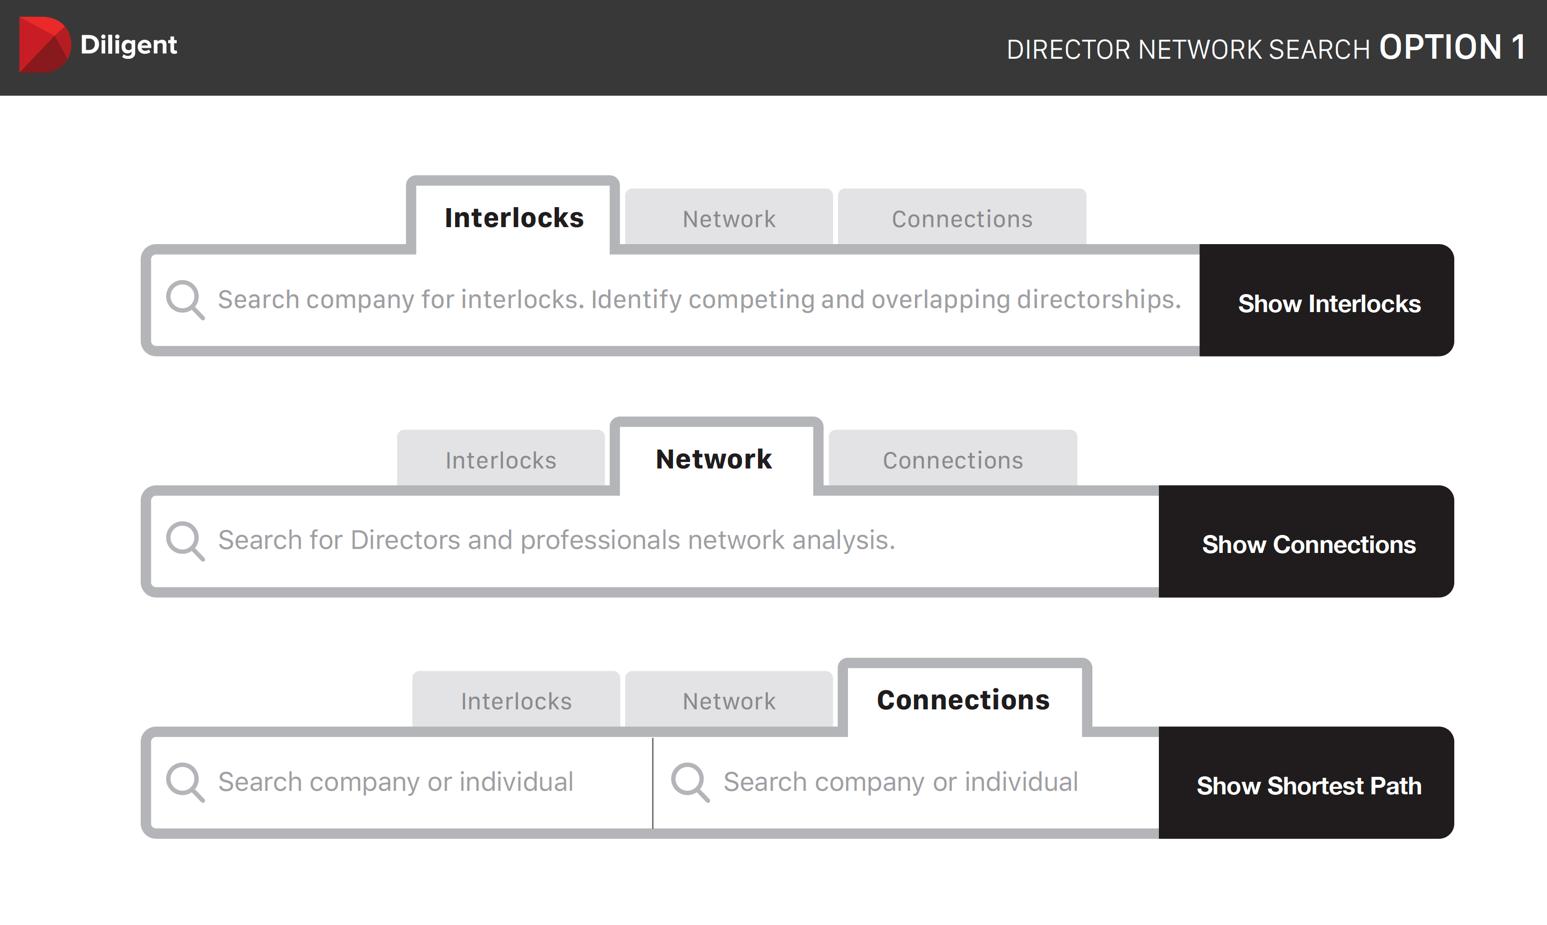 directorNetworkSearchOption1.png